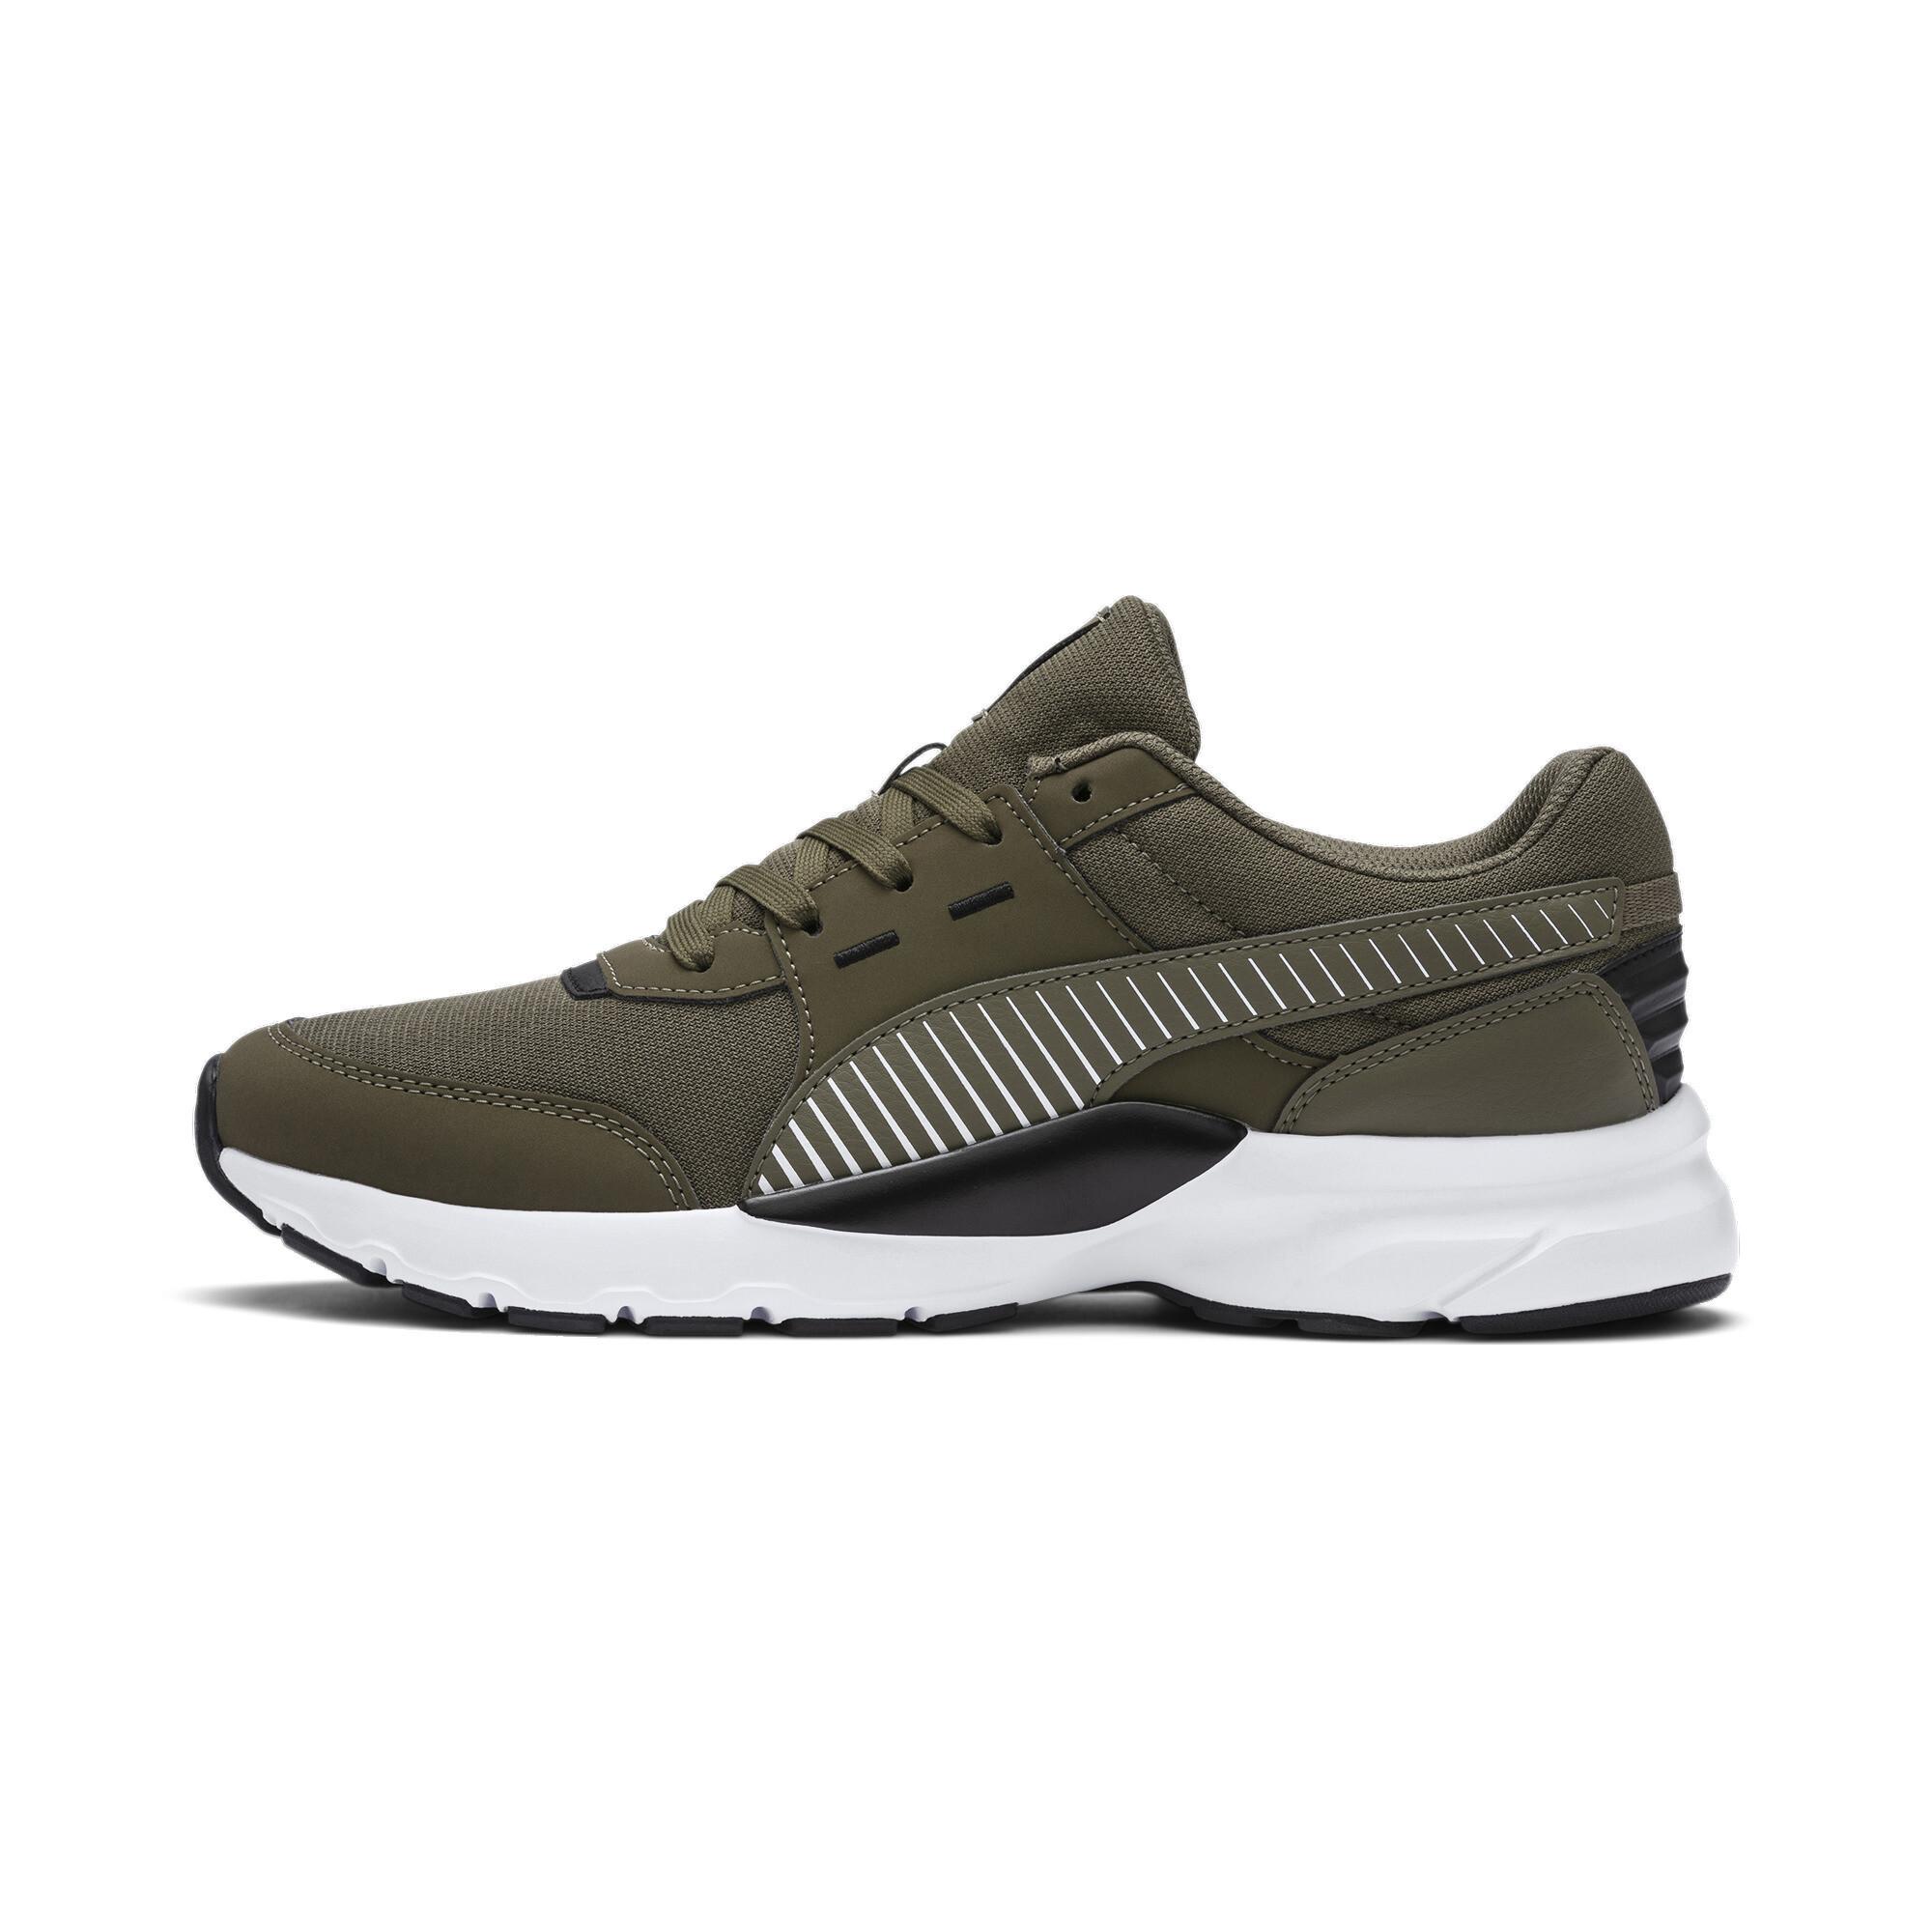 PUMA-Future-Runner-SL-Sneaker-Unisex-Schuhe-Basics-Neu Indexbild 4